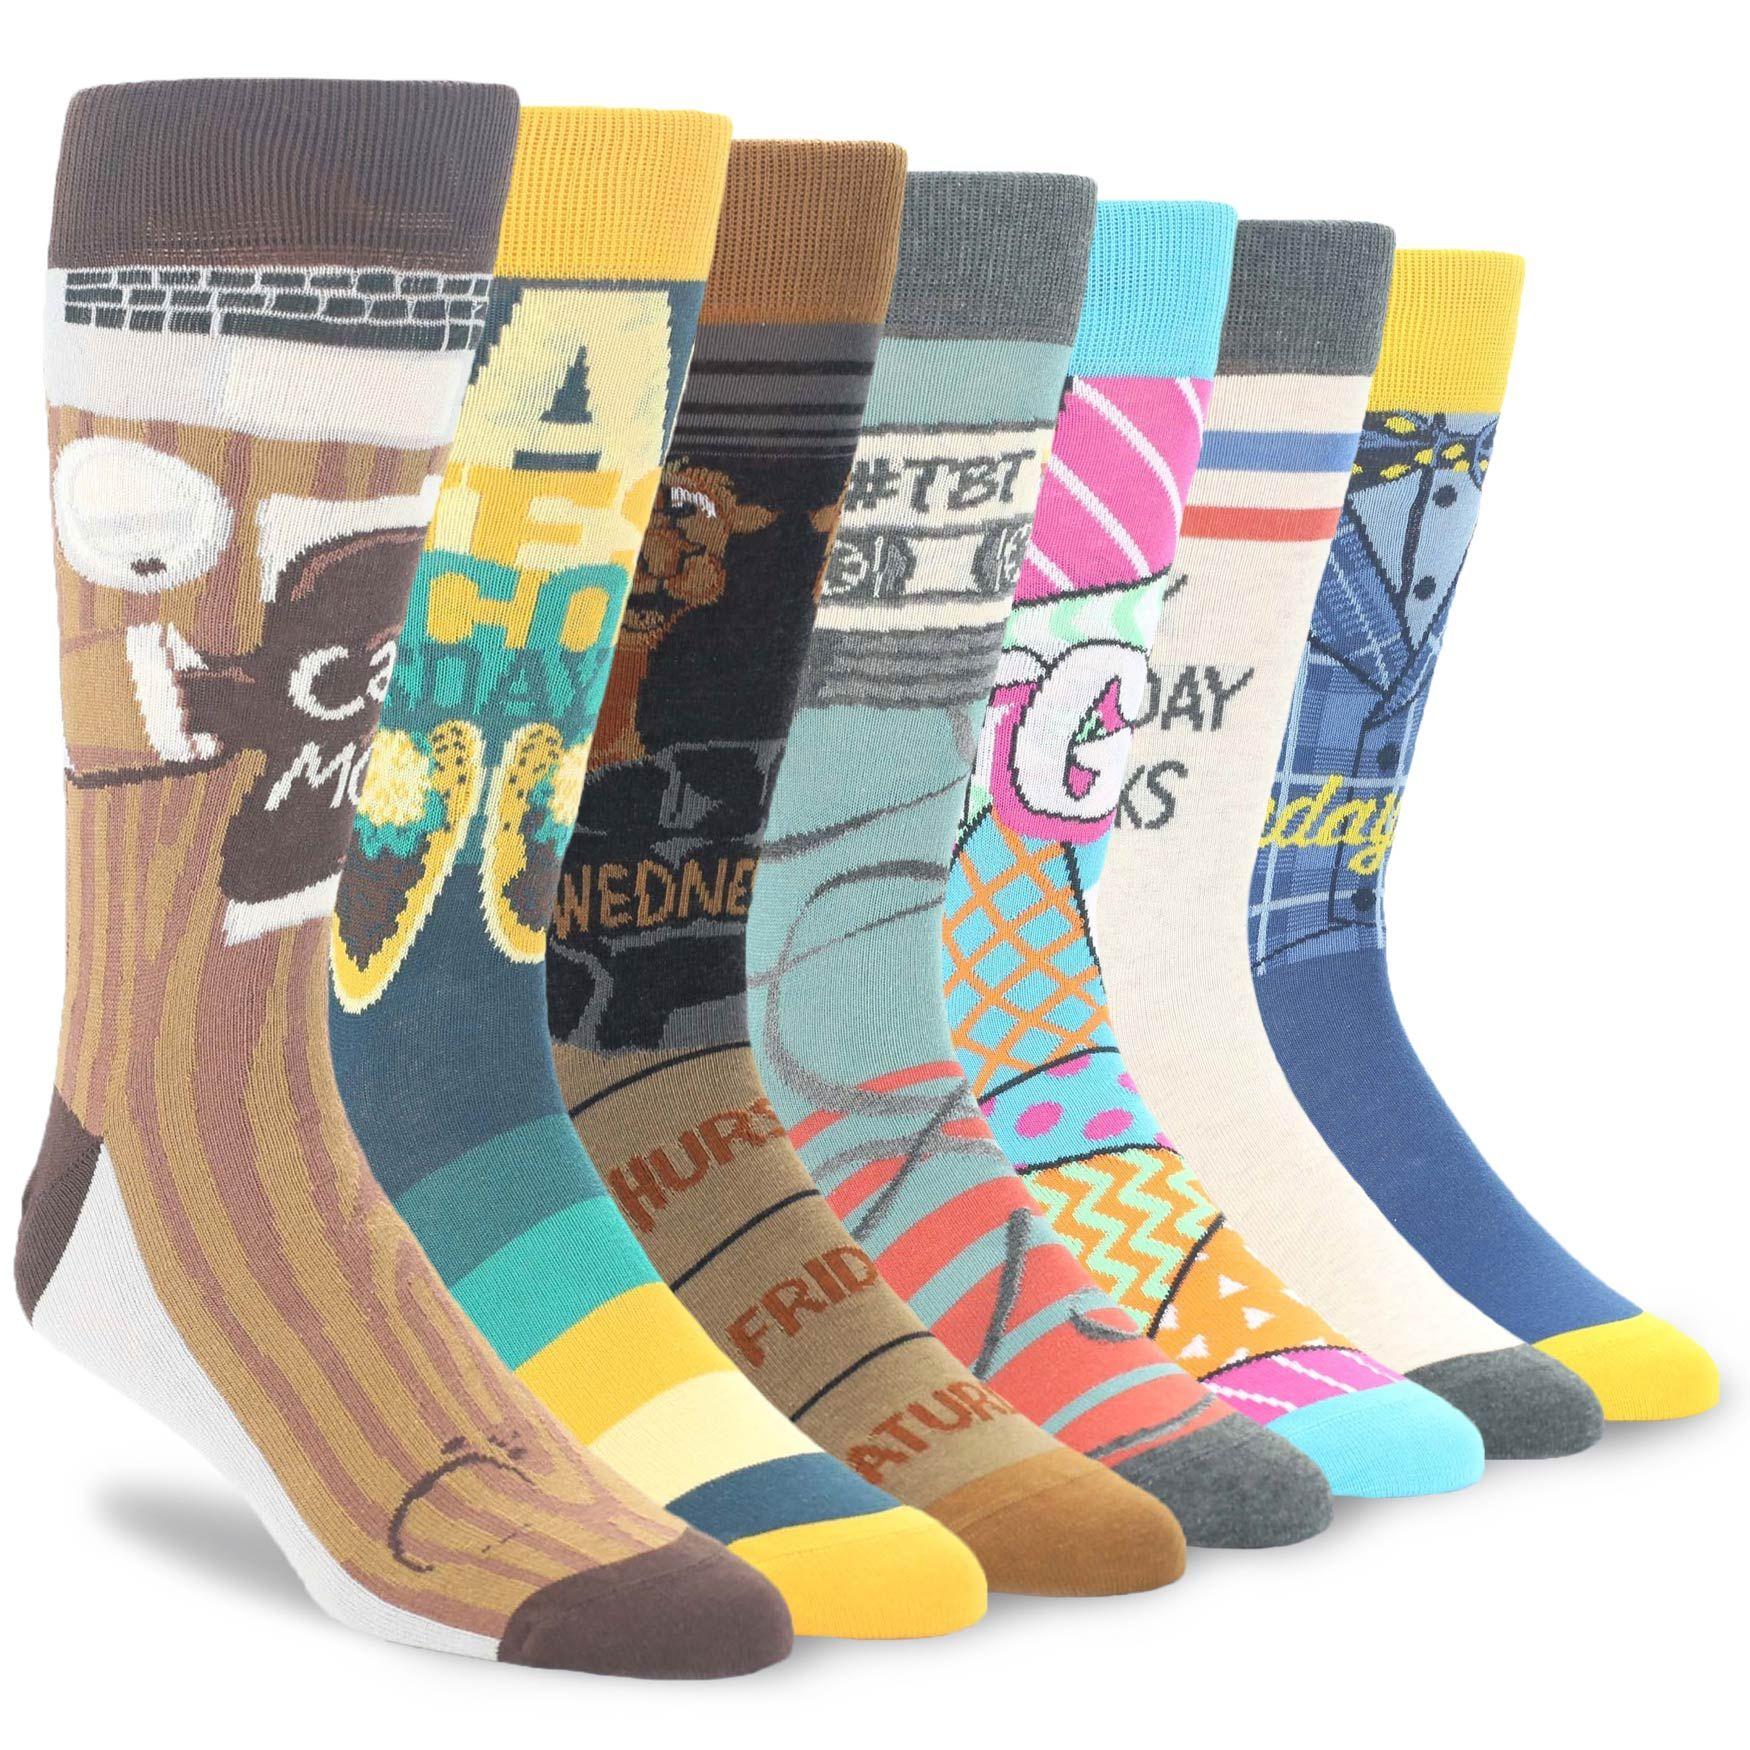 Days Of The Week Socks Days Of The Week Socks Men S Novelty Dress Socks Collection 7